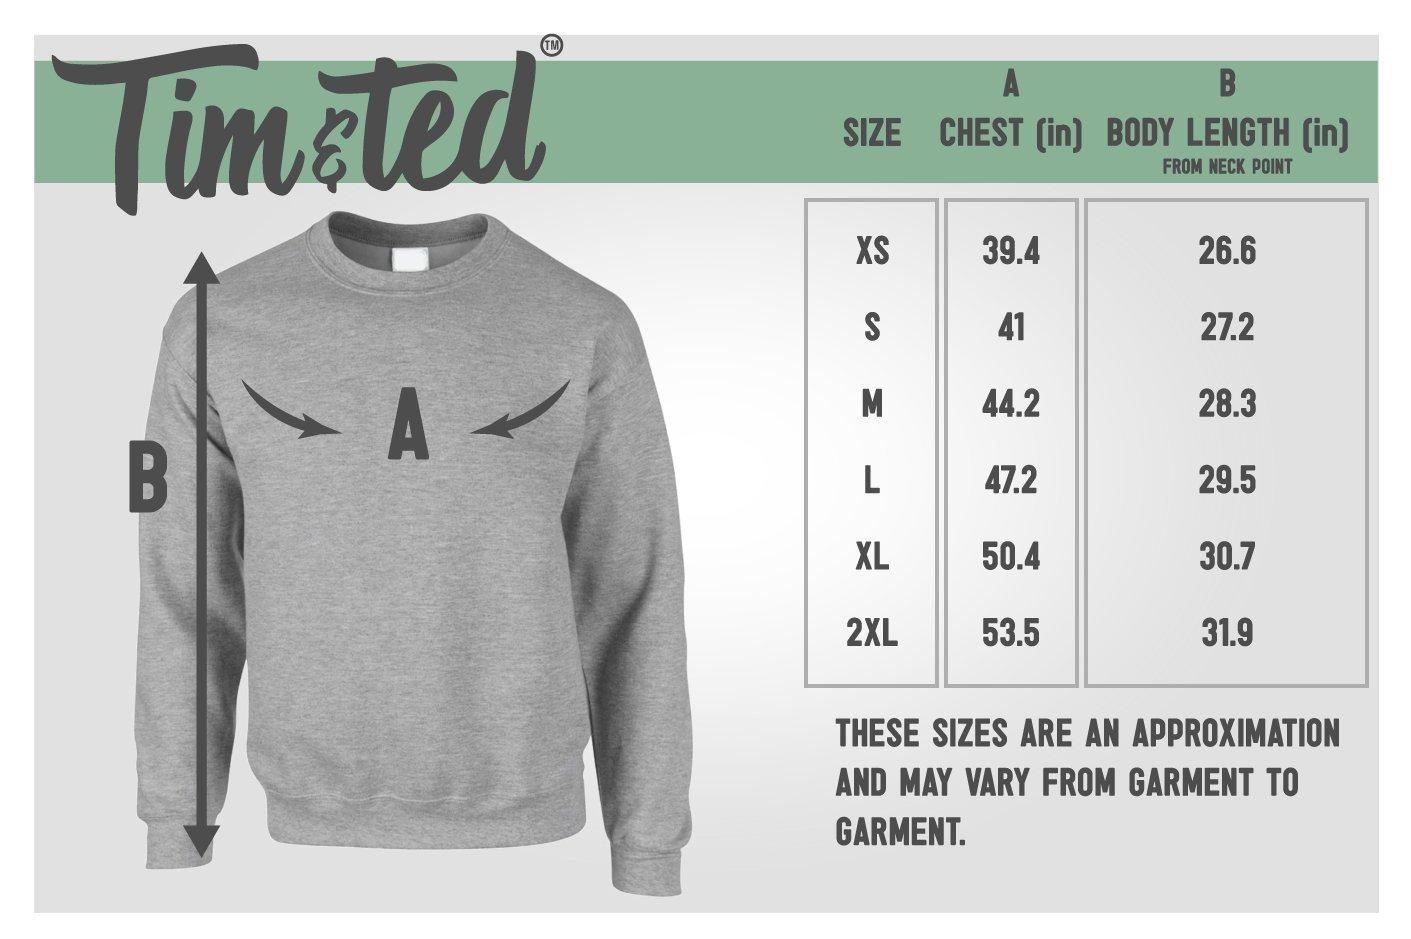 Tim And Ted Christmas Jumper Sweater Sweatshirt Spoiler